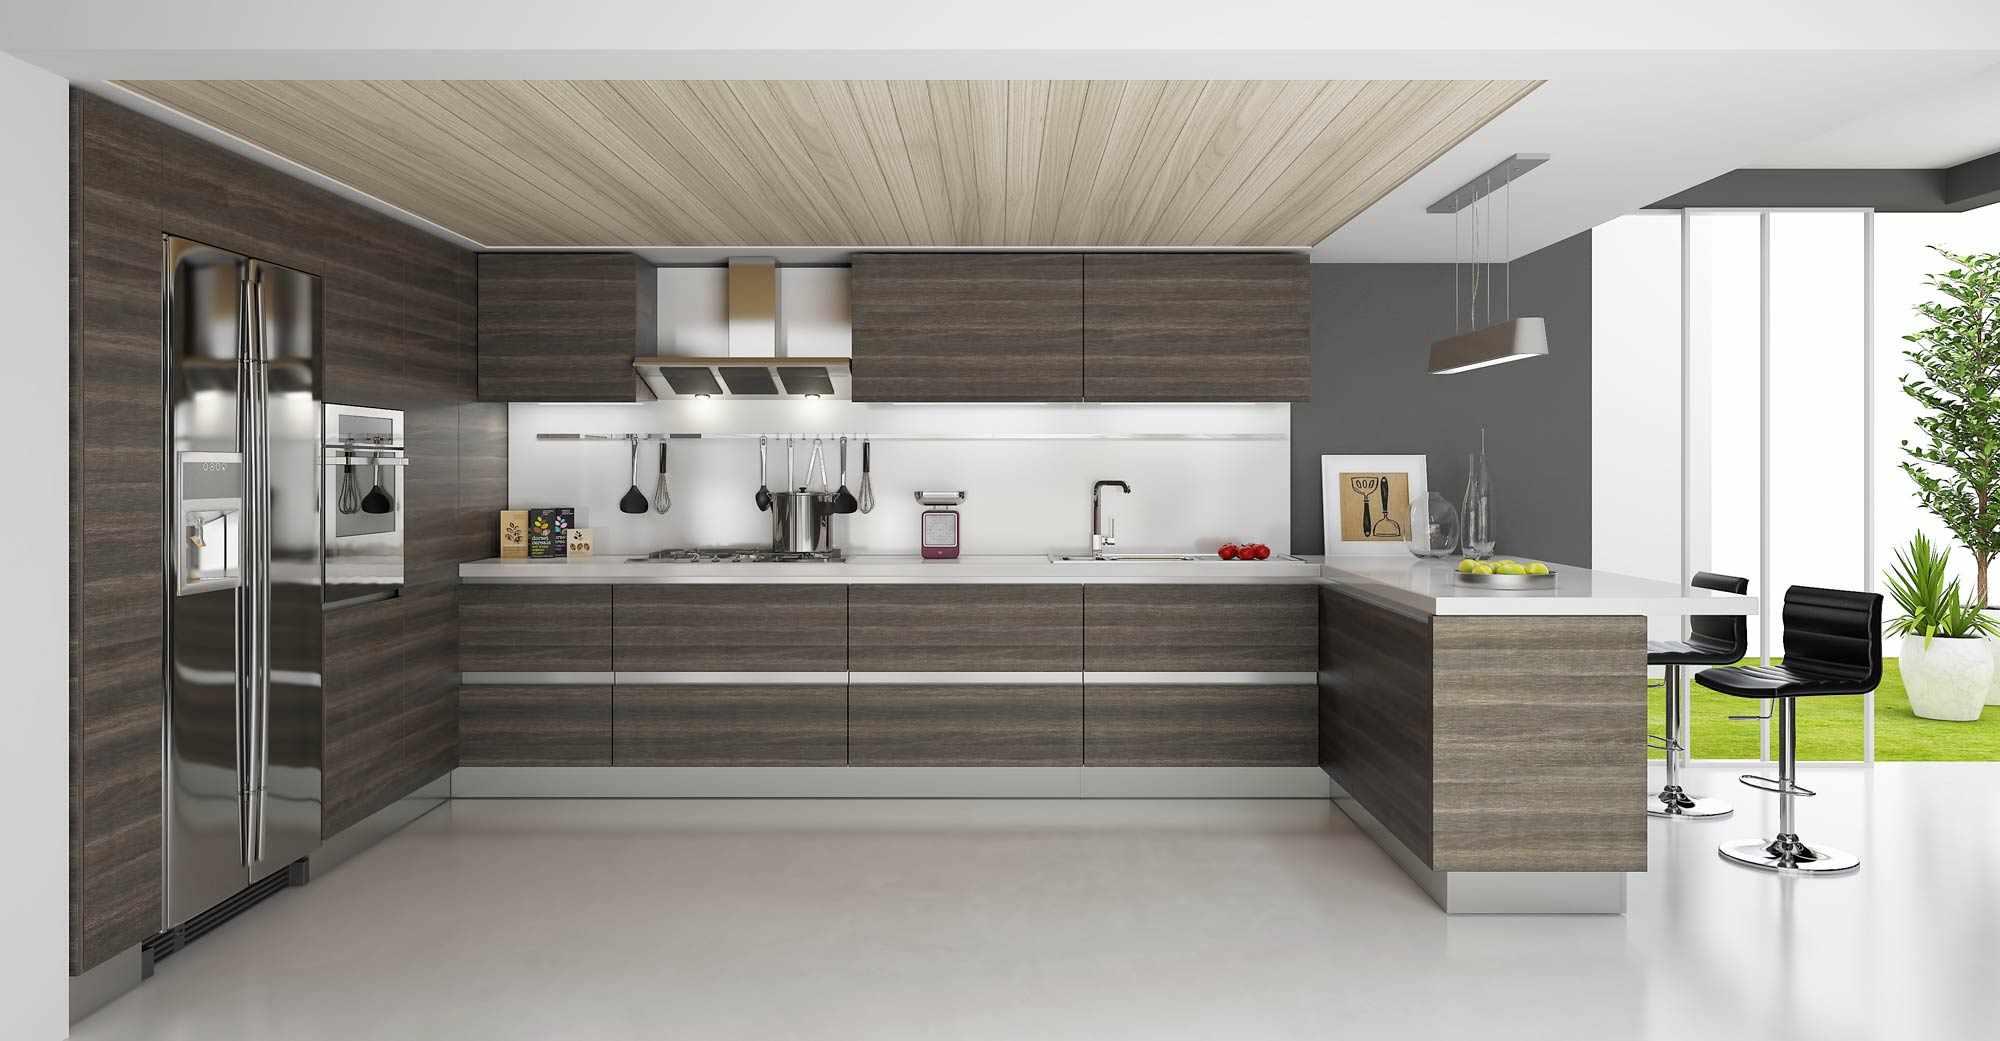 Кухонный гарнитур на кухне в стиле модерн